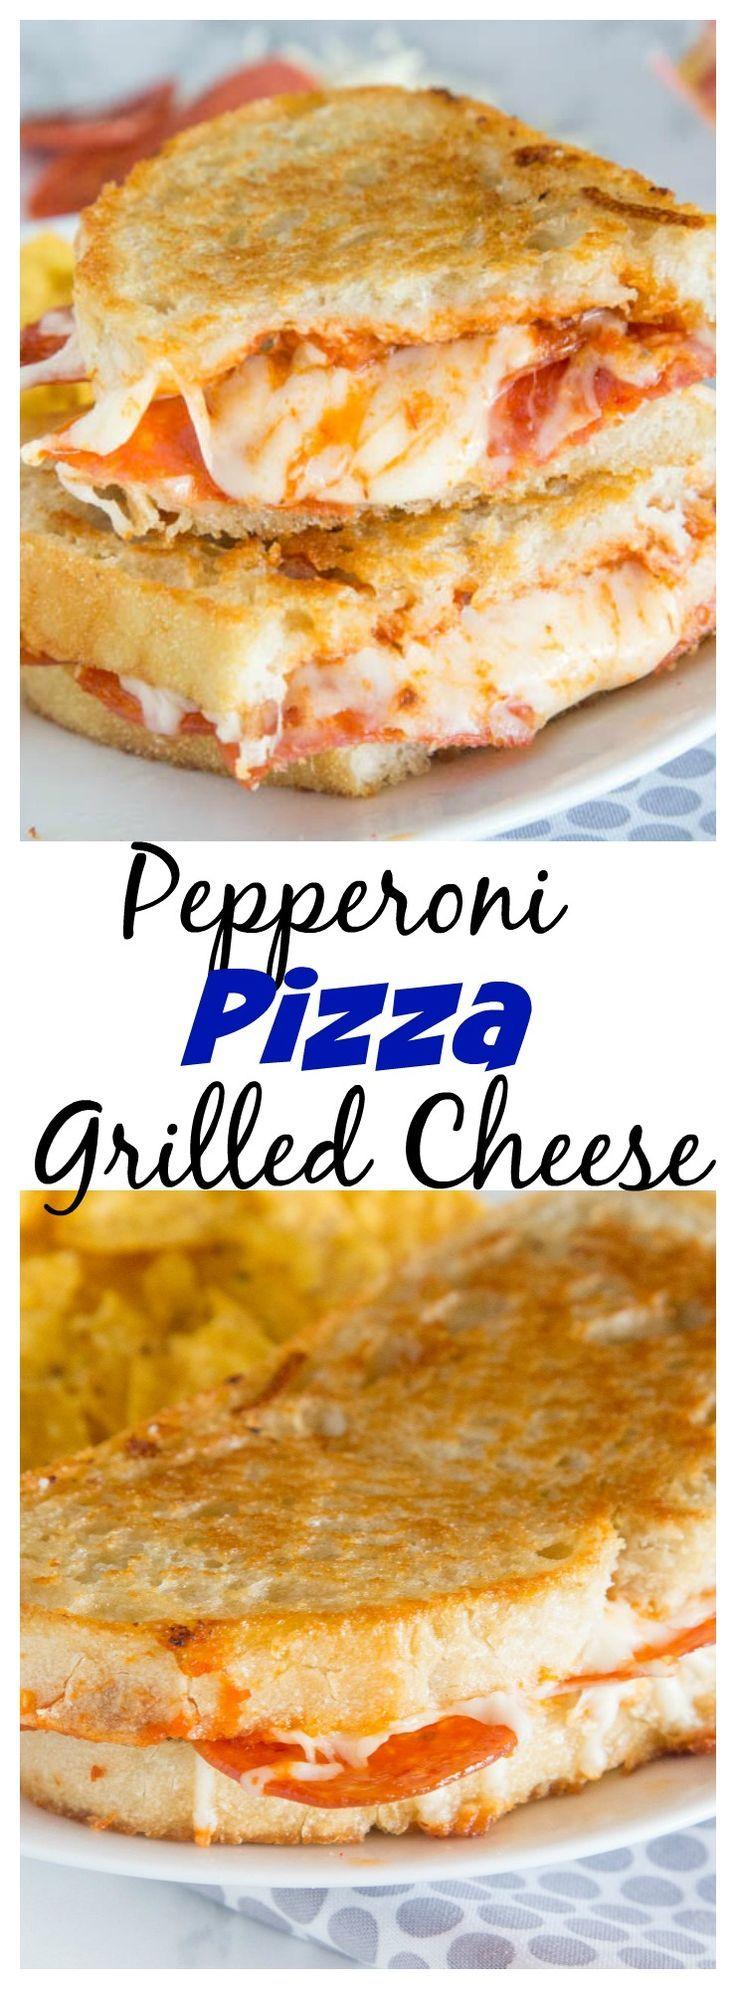 Pepperoni Pizza Grilled Cheese Sandwich – Take your favorite grilled cheese sandwich up a notch and make it taste like pepperoni pizza!